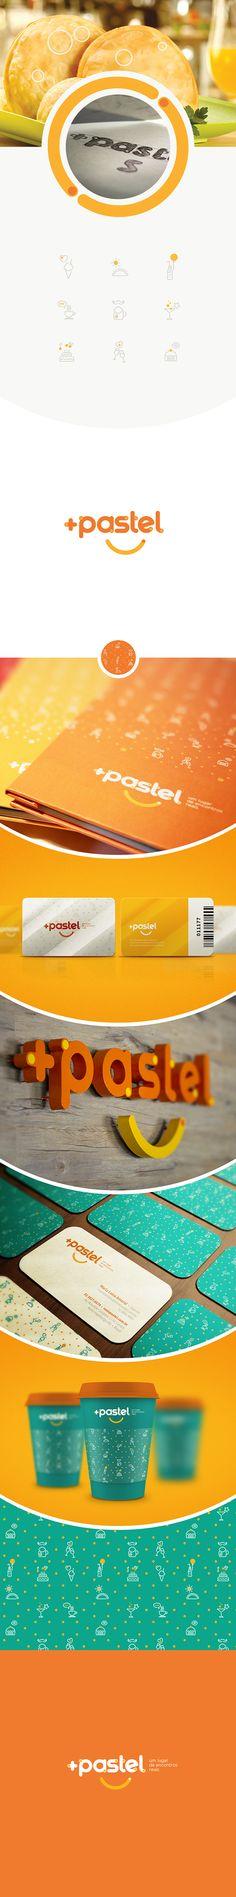 Identidade/logo para Mais Pastel.